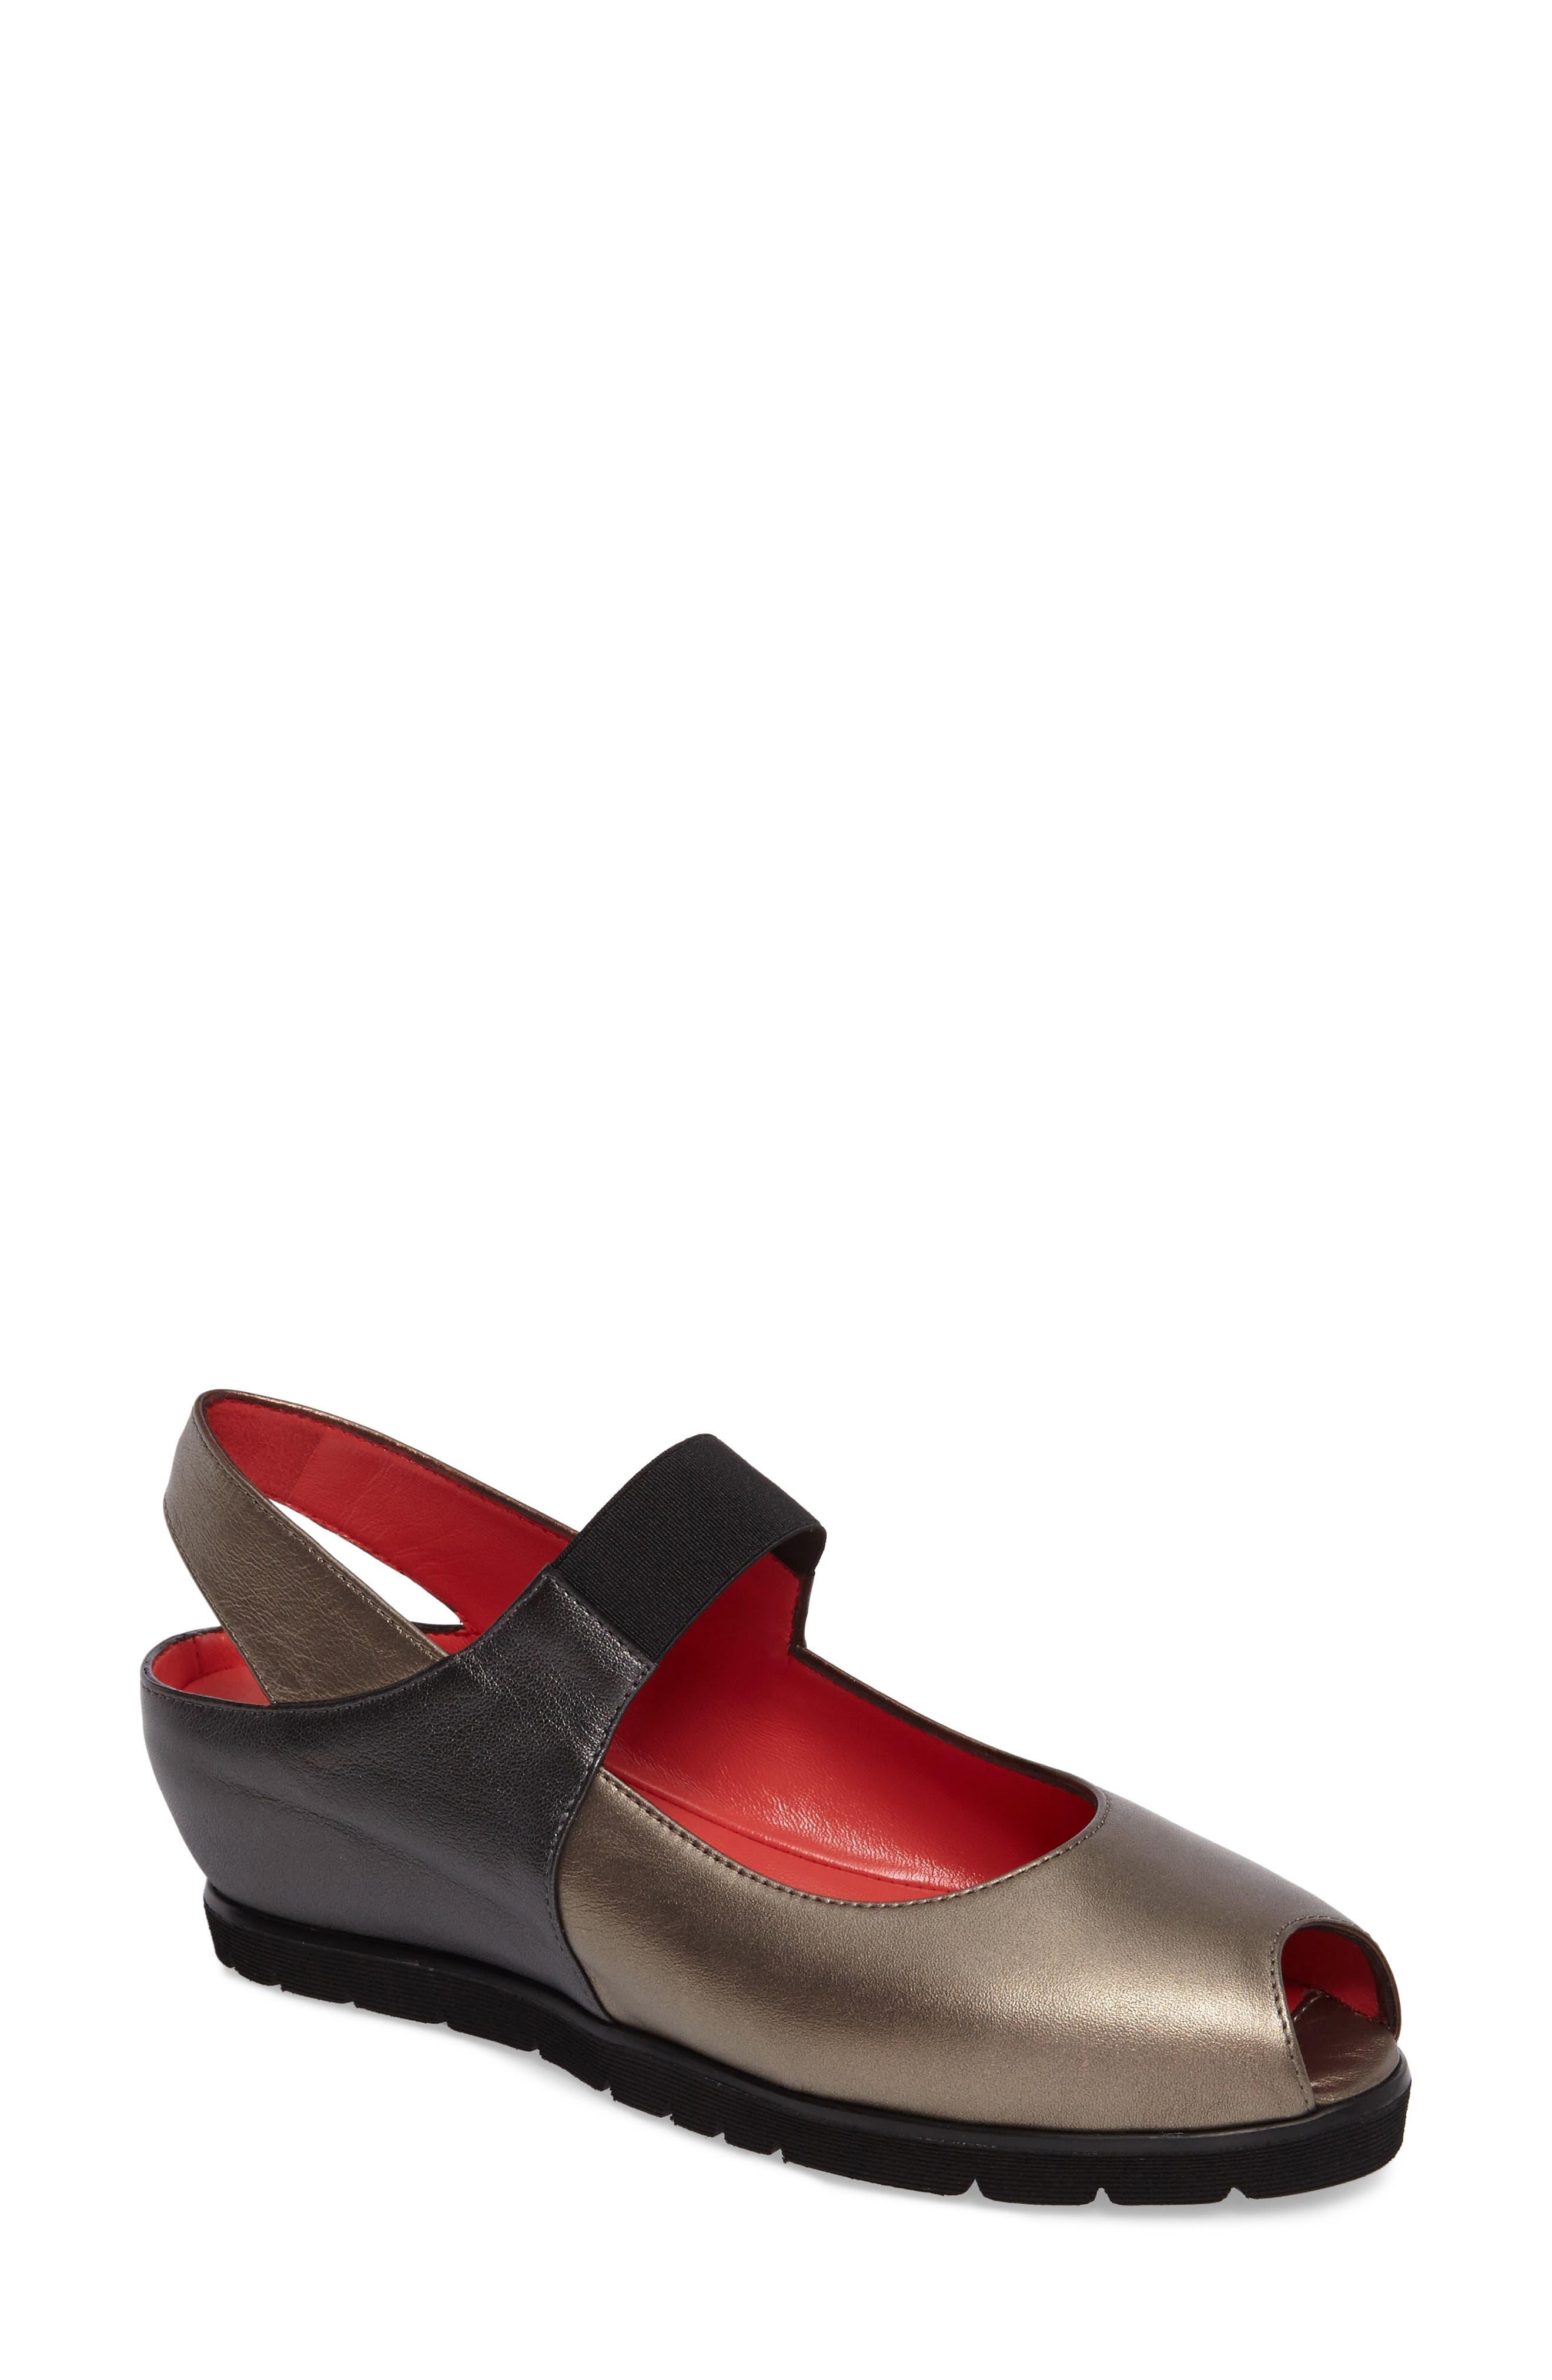 Main Image - Pas de Rouge Slingback Peep Toe Wedge (Women)